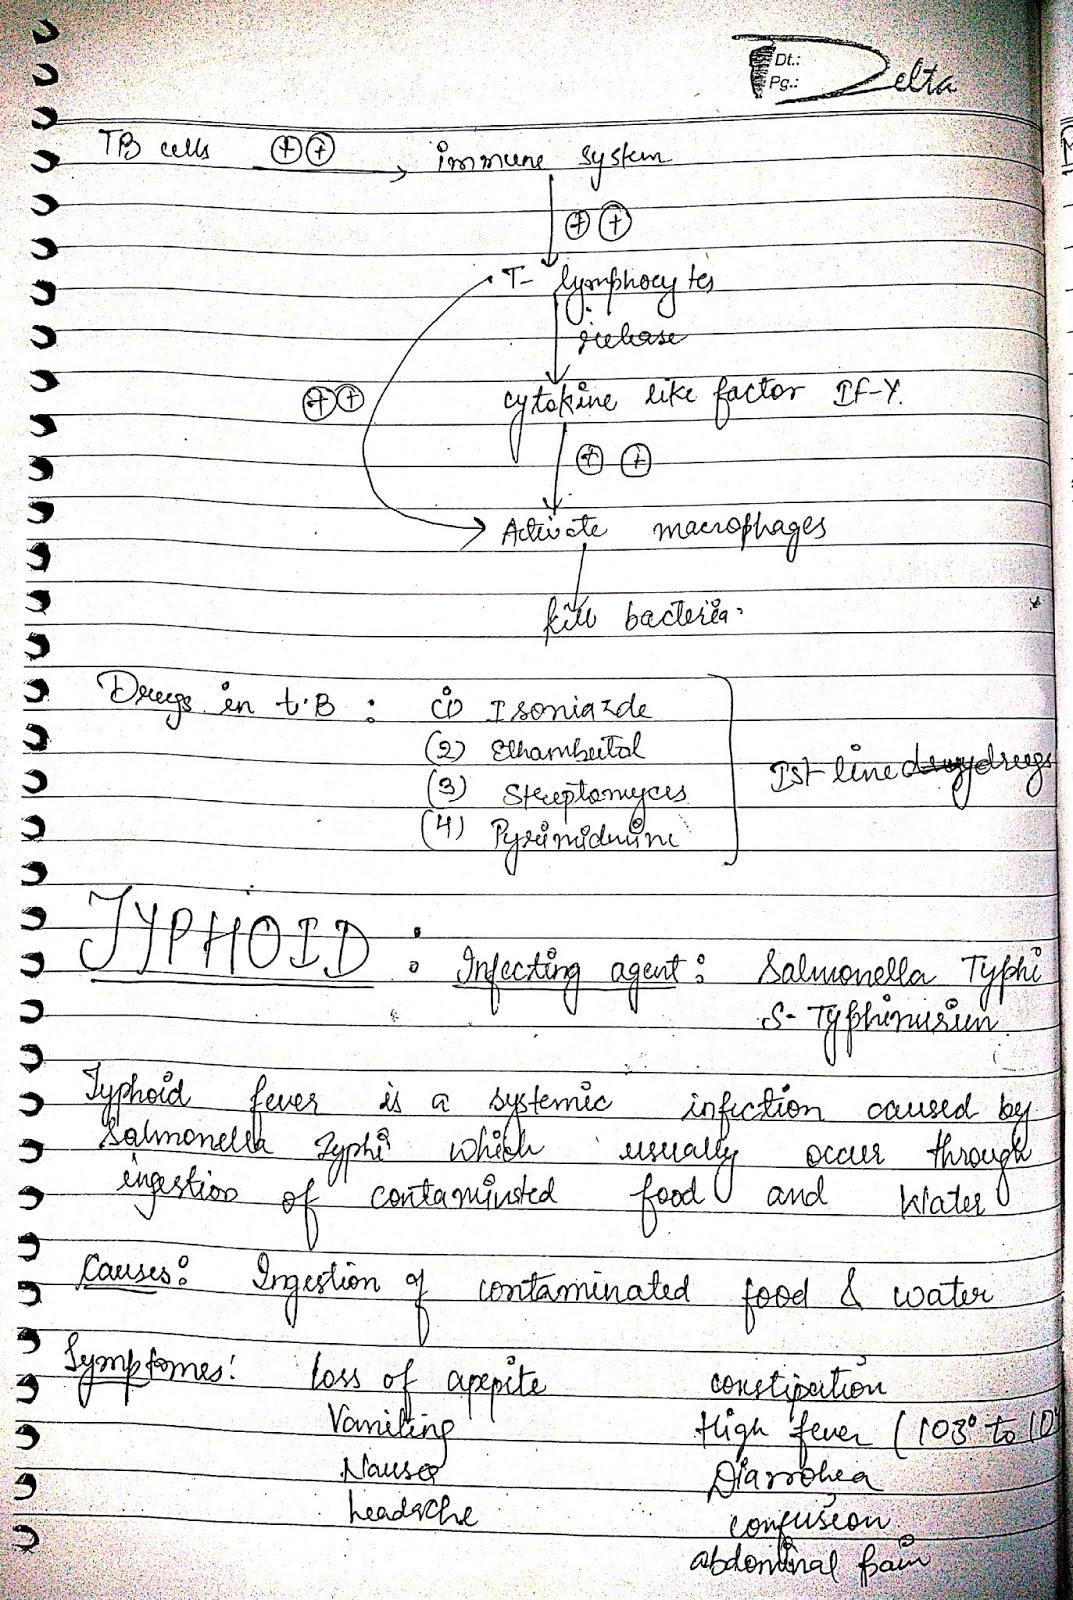 pathophysiology - typhoid